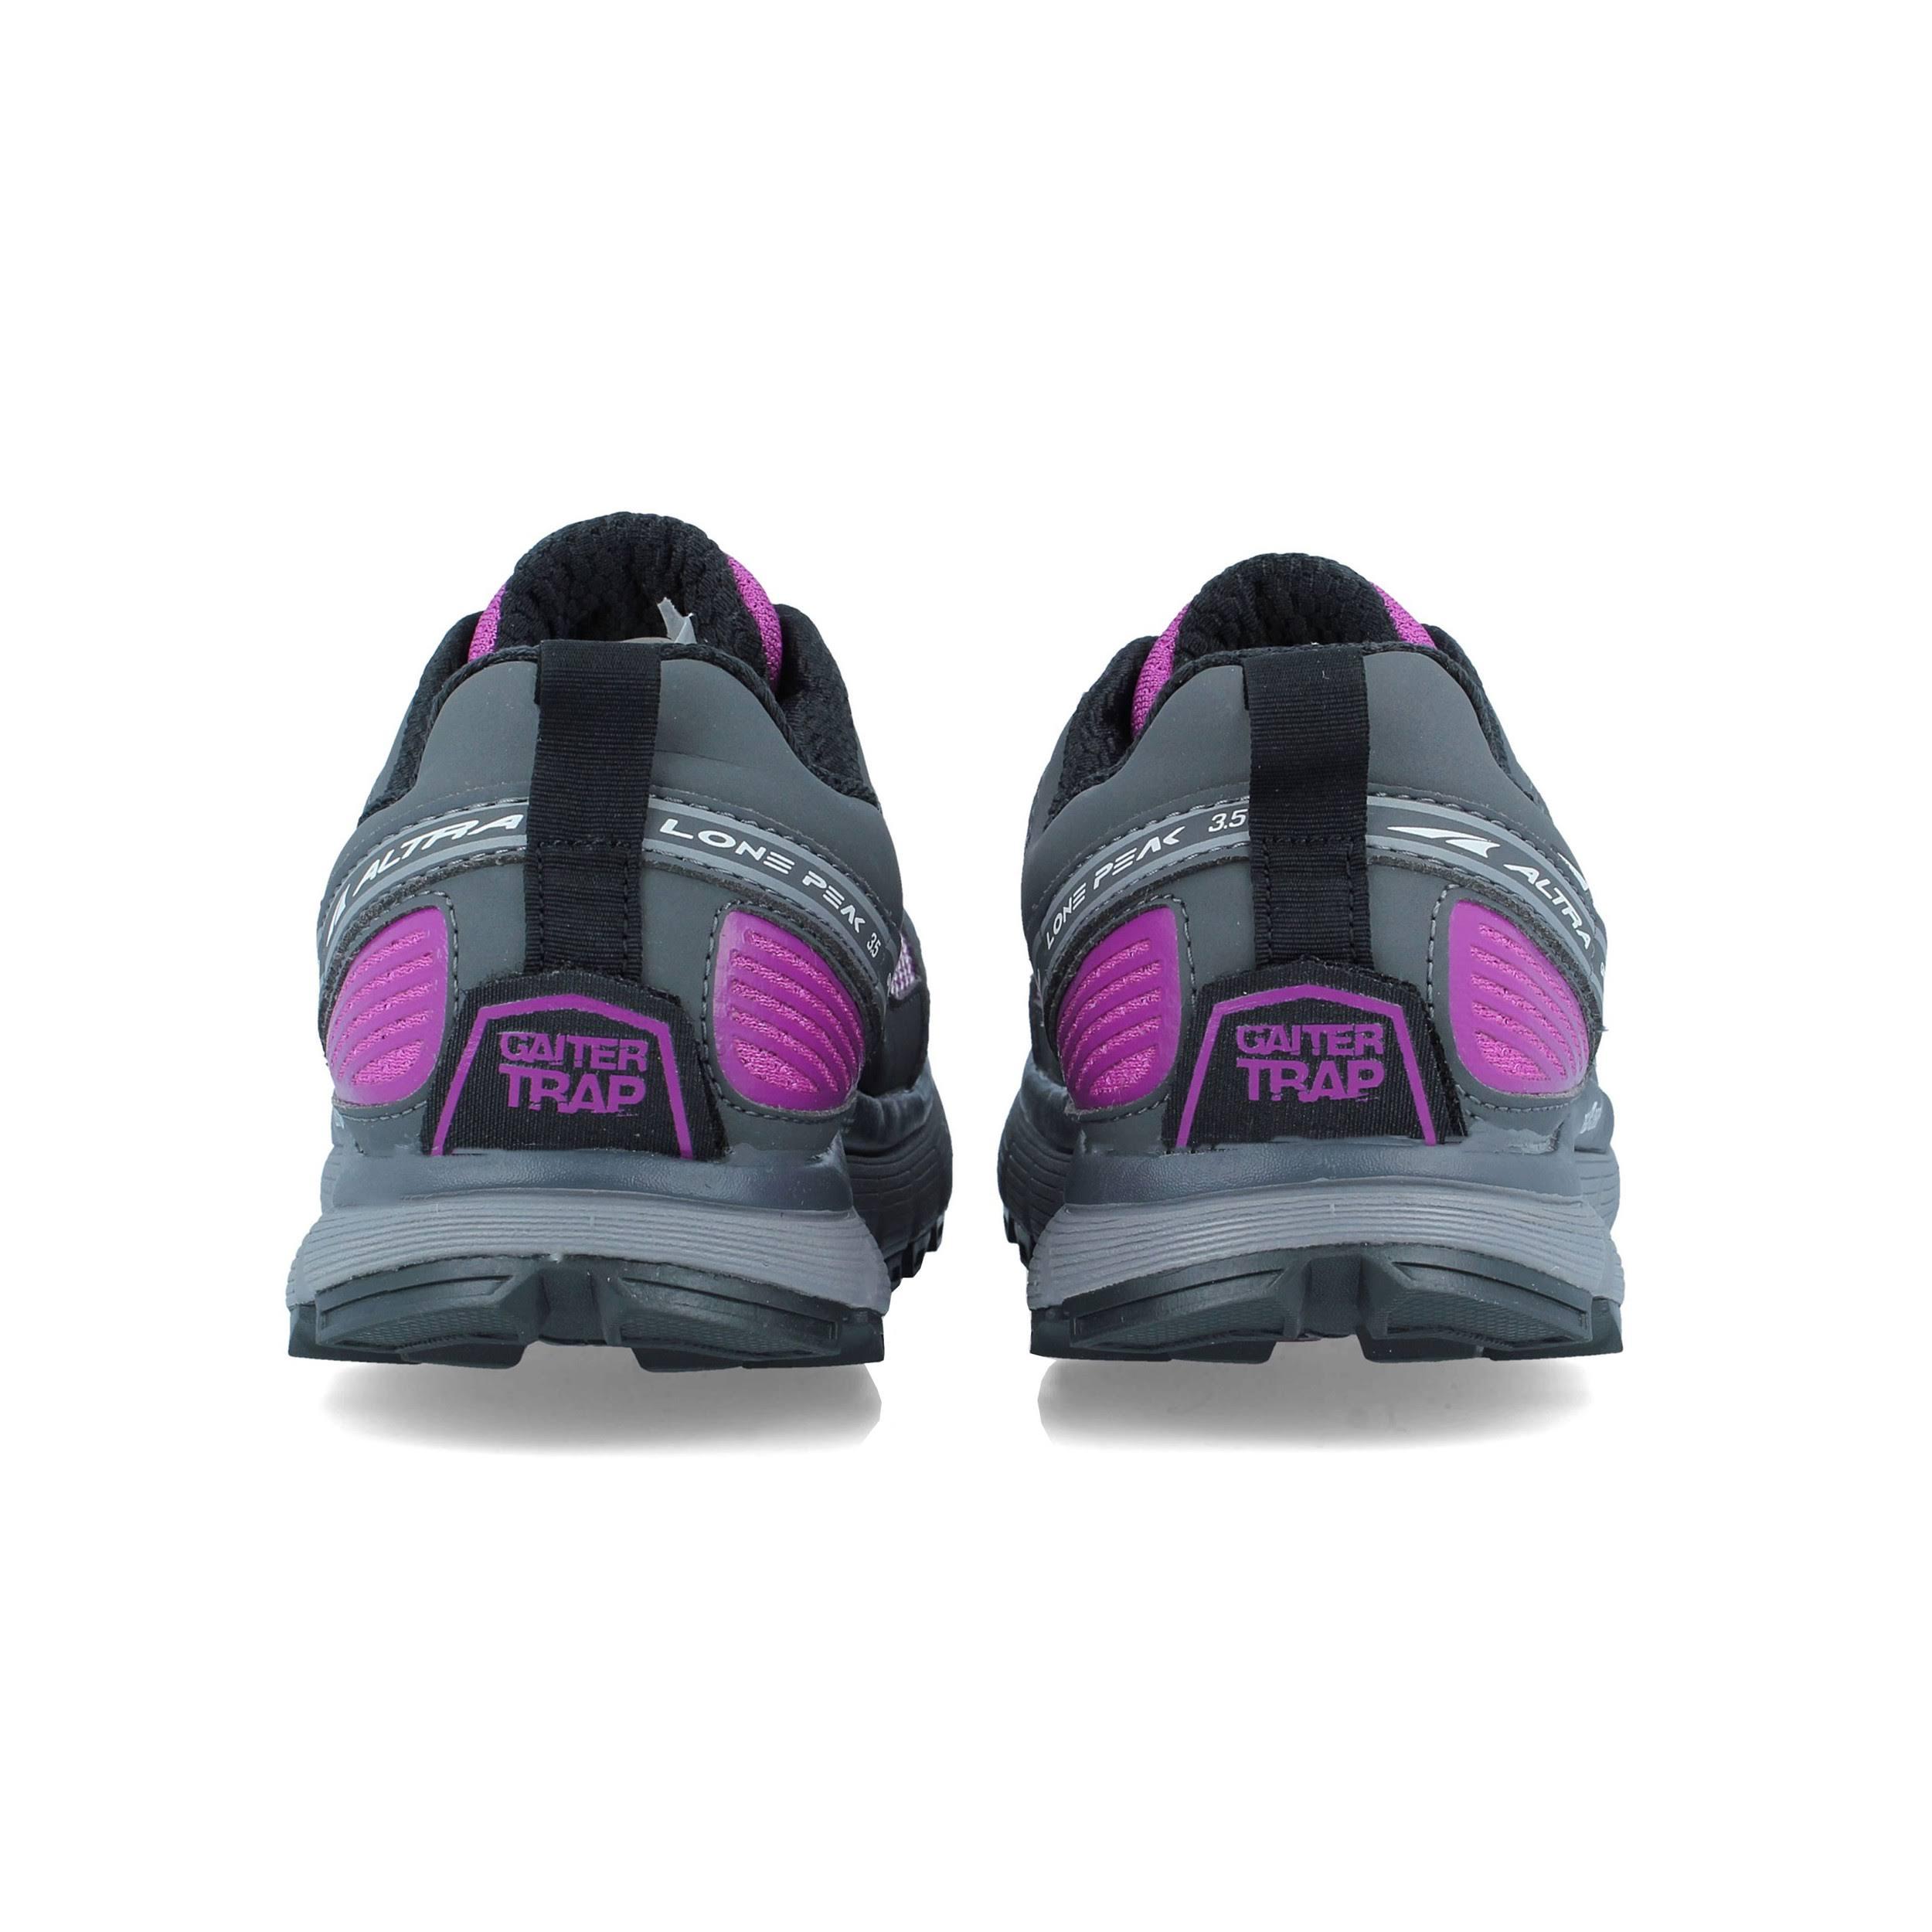 Mujer Altra Oscuro Running Blanco Peak Púrpura Gris Lone Zapatillas 7 5 3 Para De Púrpura WSpf4fnt